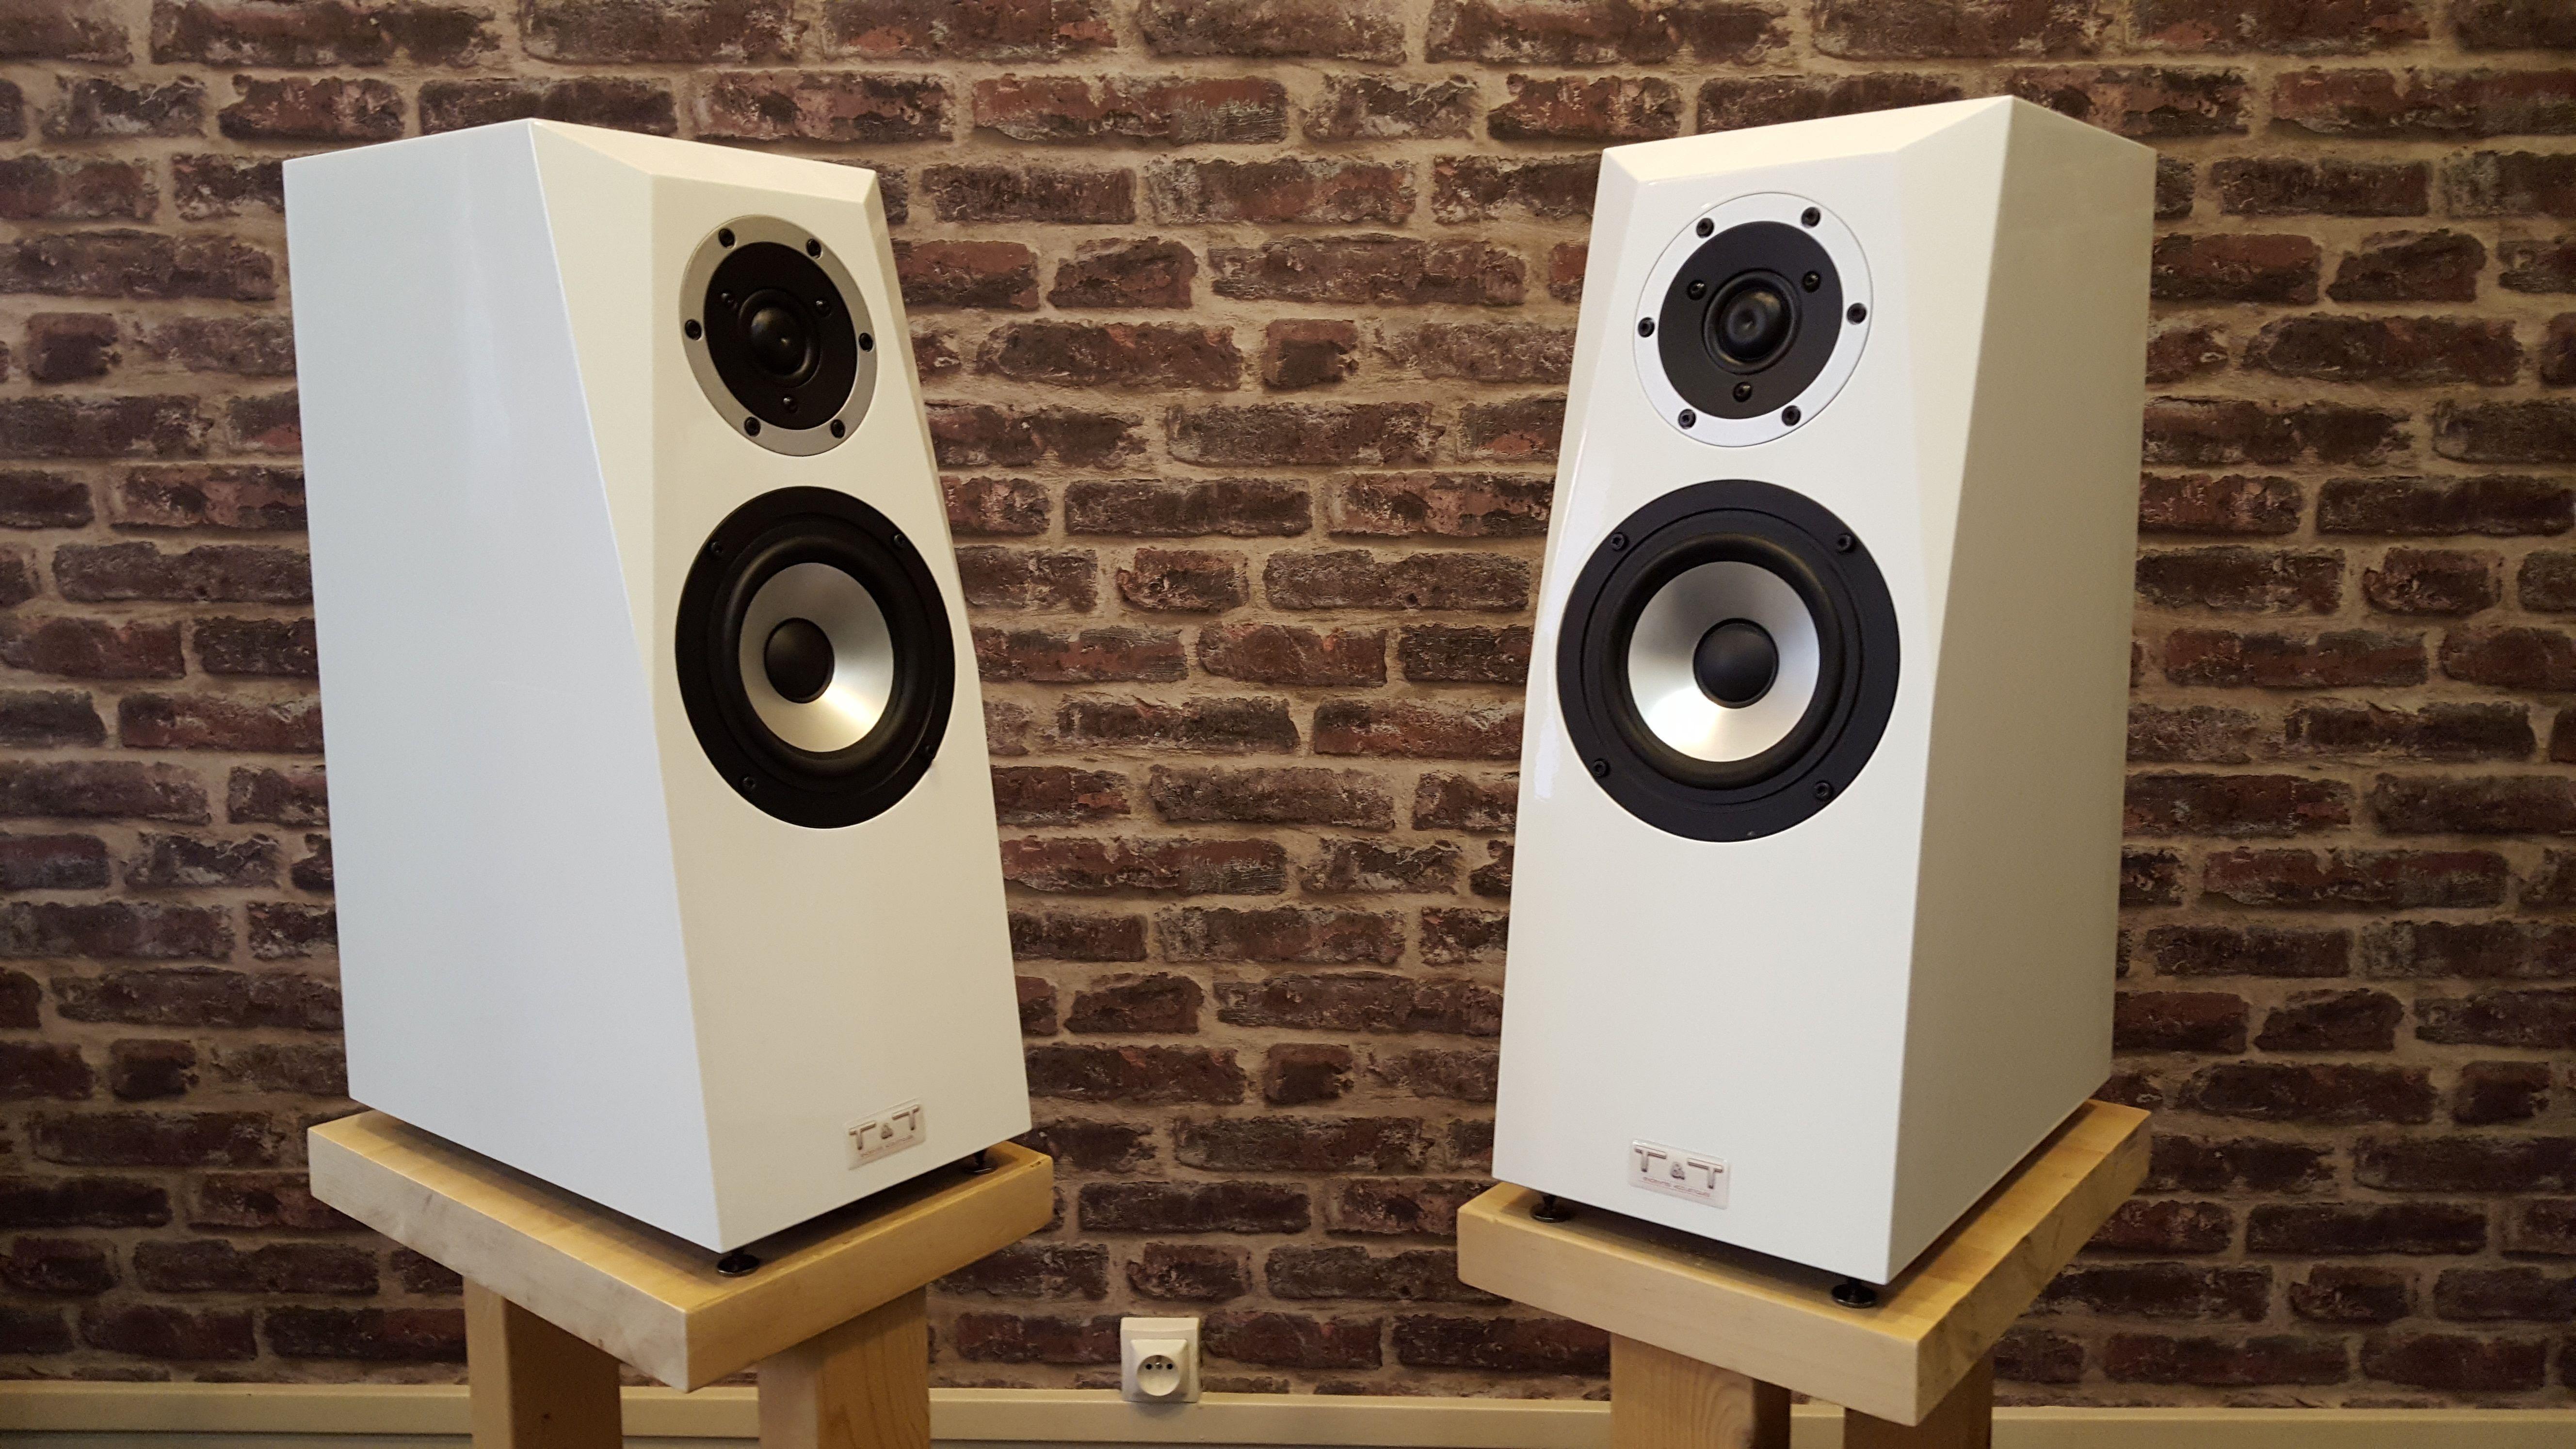 enceintes bibliotheque high end haut parleurs visaton sb acoustics composants haut de gamme floor standing speakers hifi monitor speakers